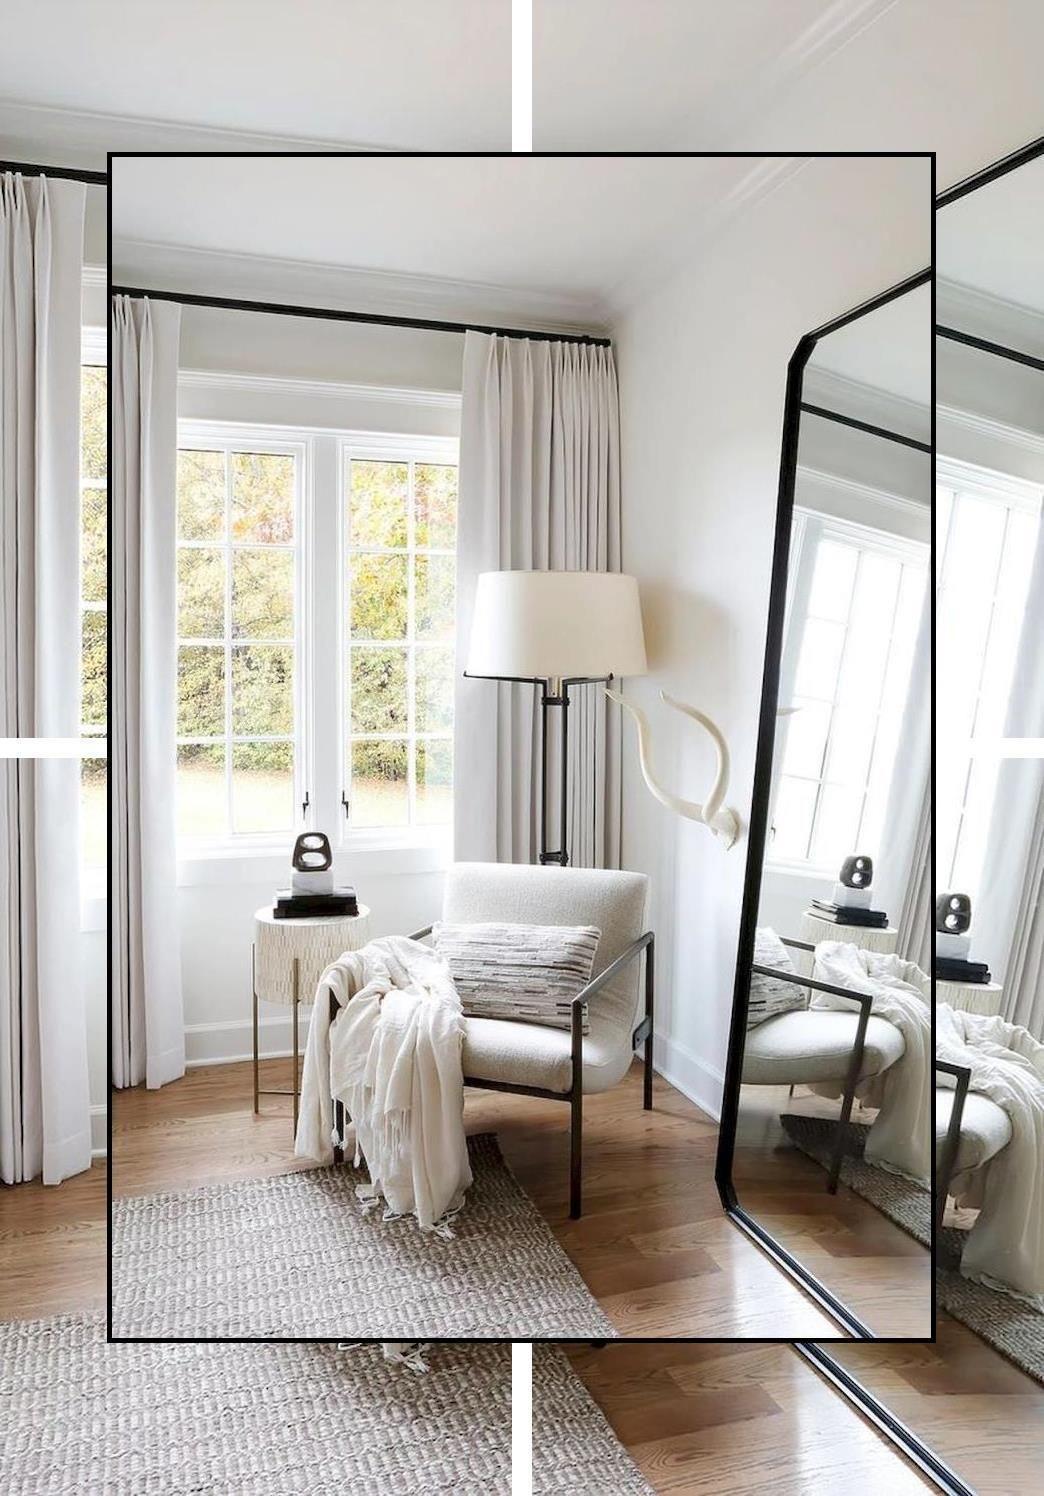 Buy Bedroom Set Designer Furniture Stores Where To